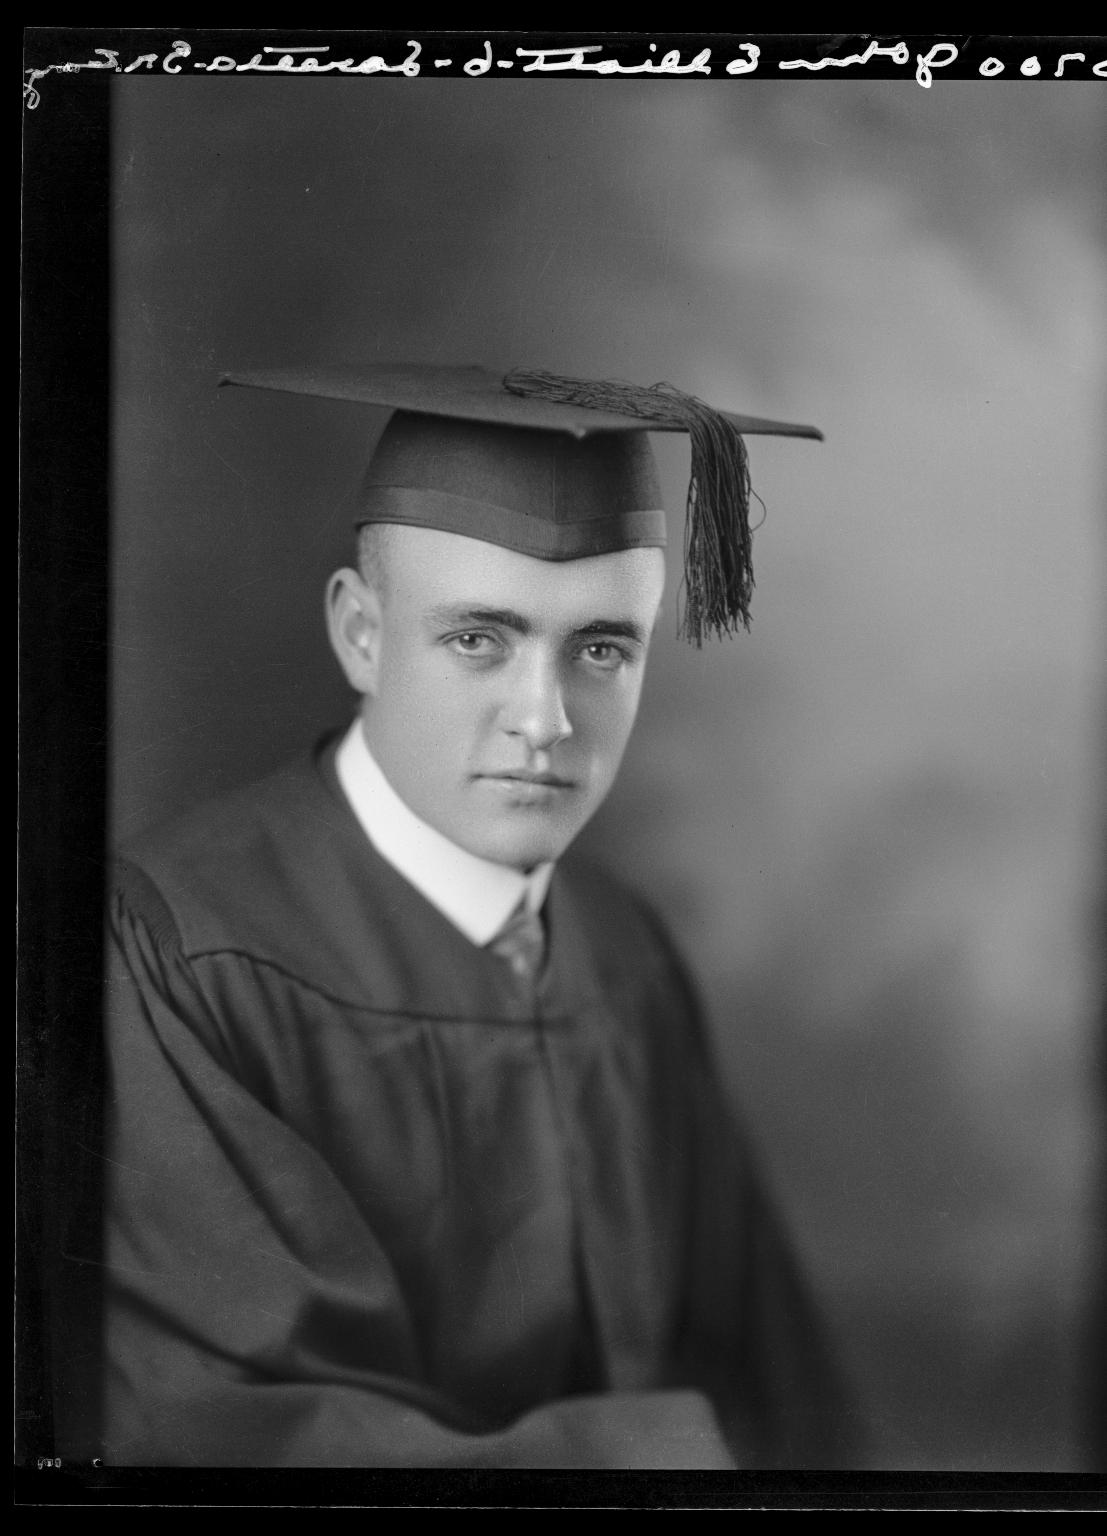 Portraits of John Elliott